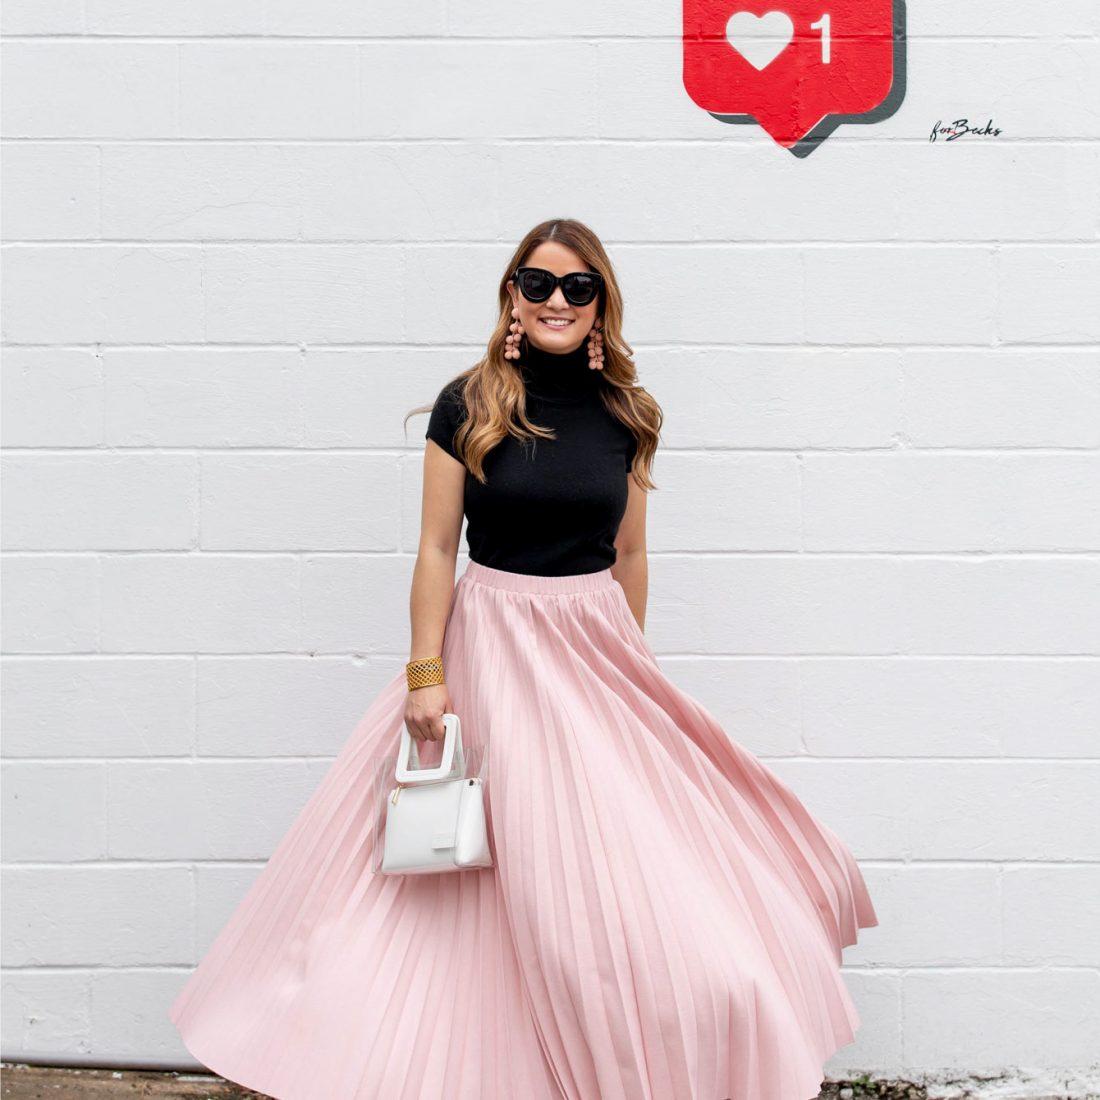 Jennifer Lake Twirling Skirt